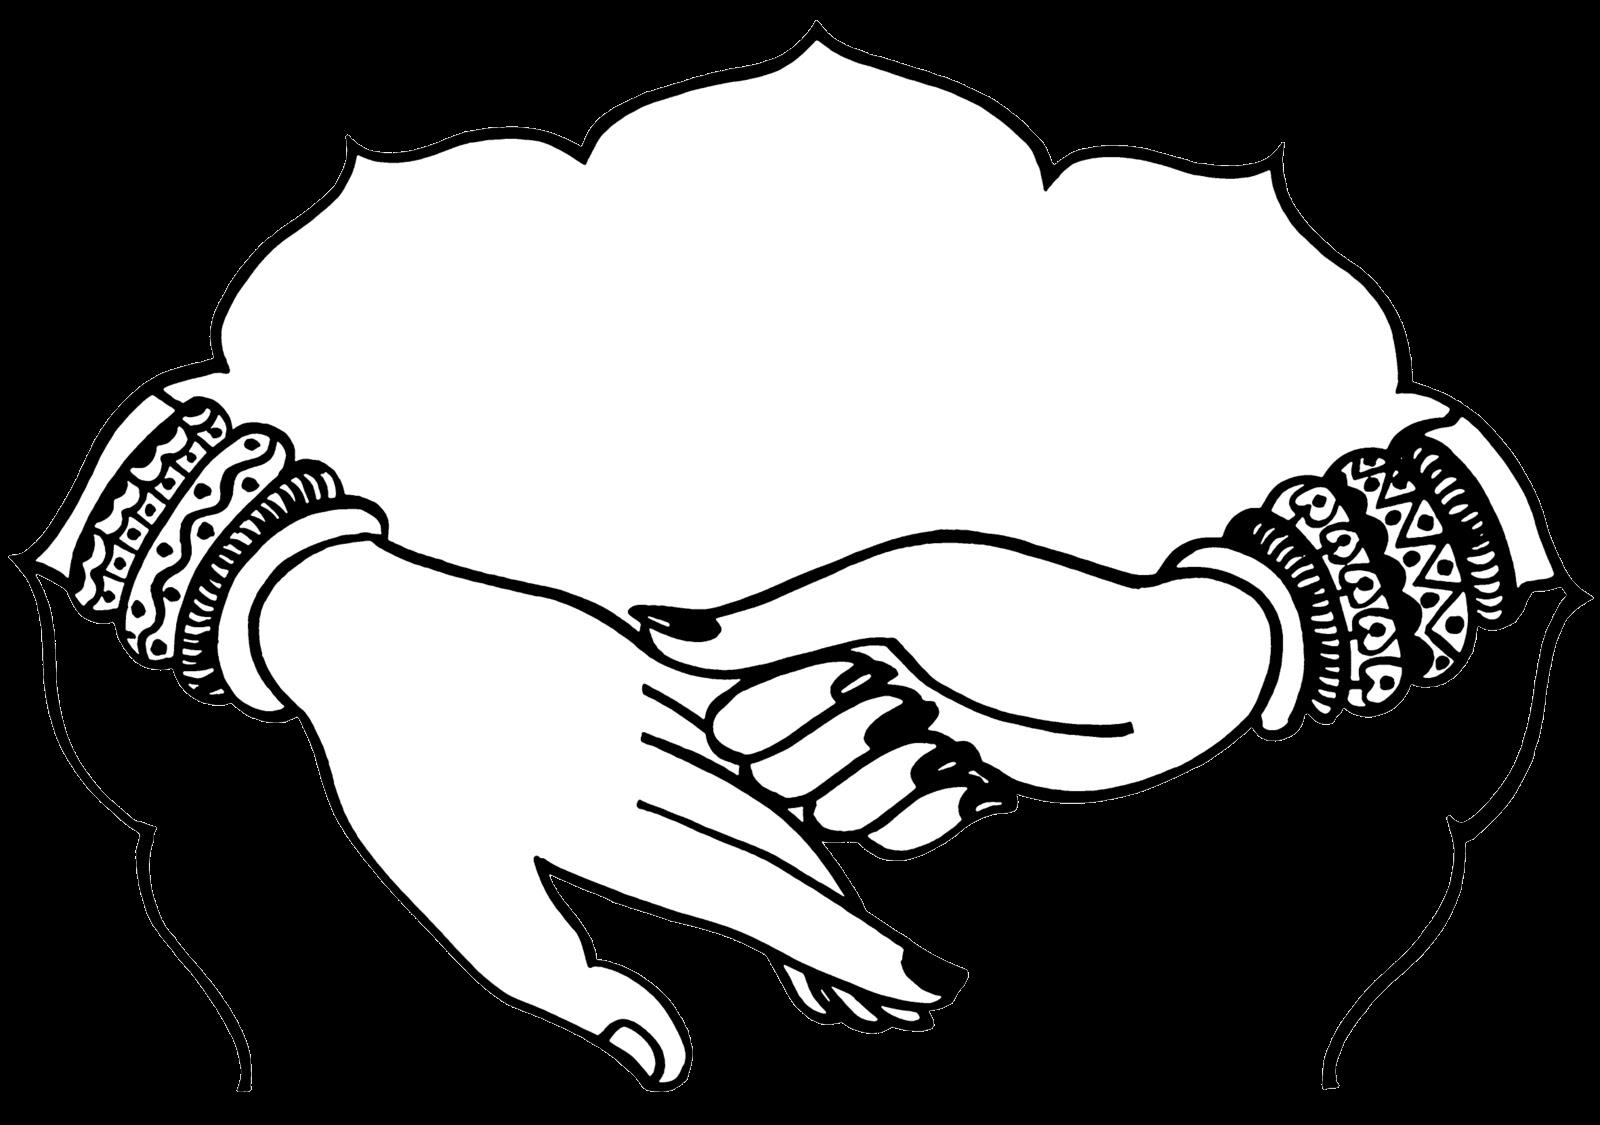 Handshake clipart wedding. Free best on transparent